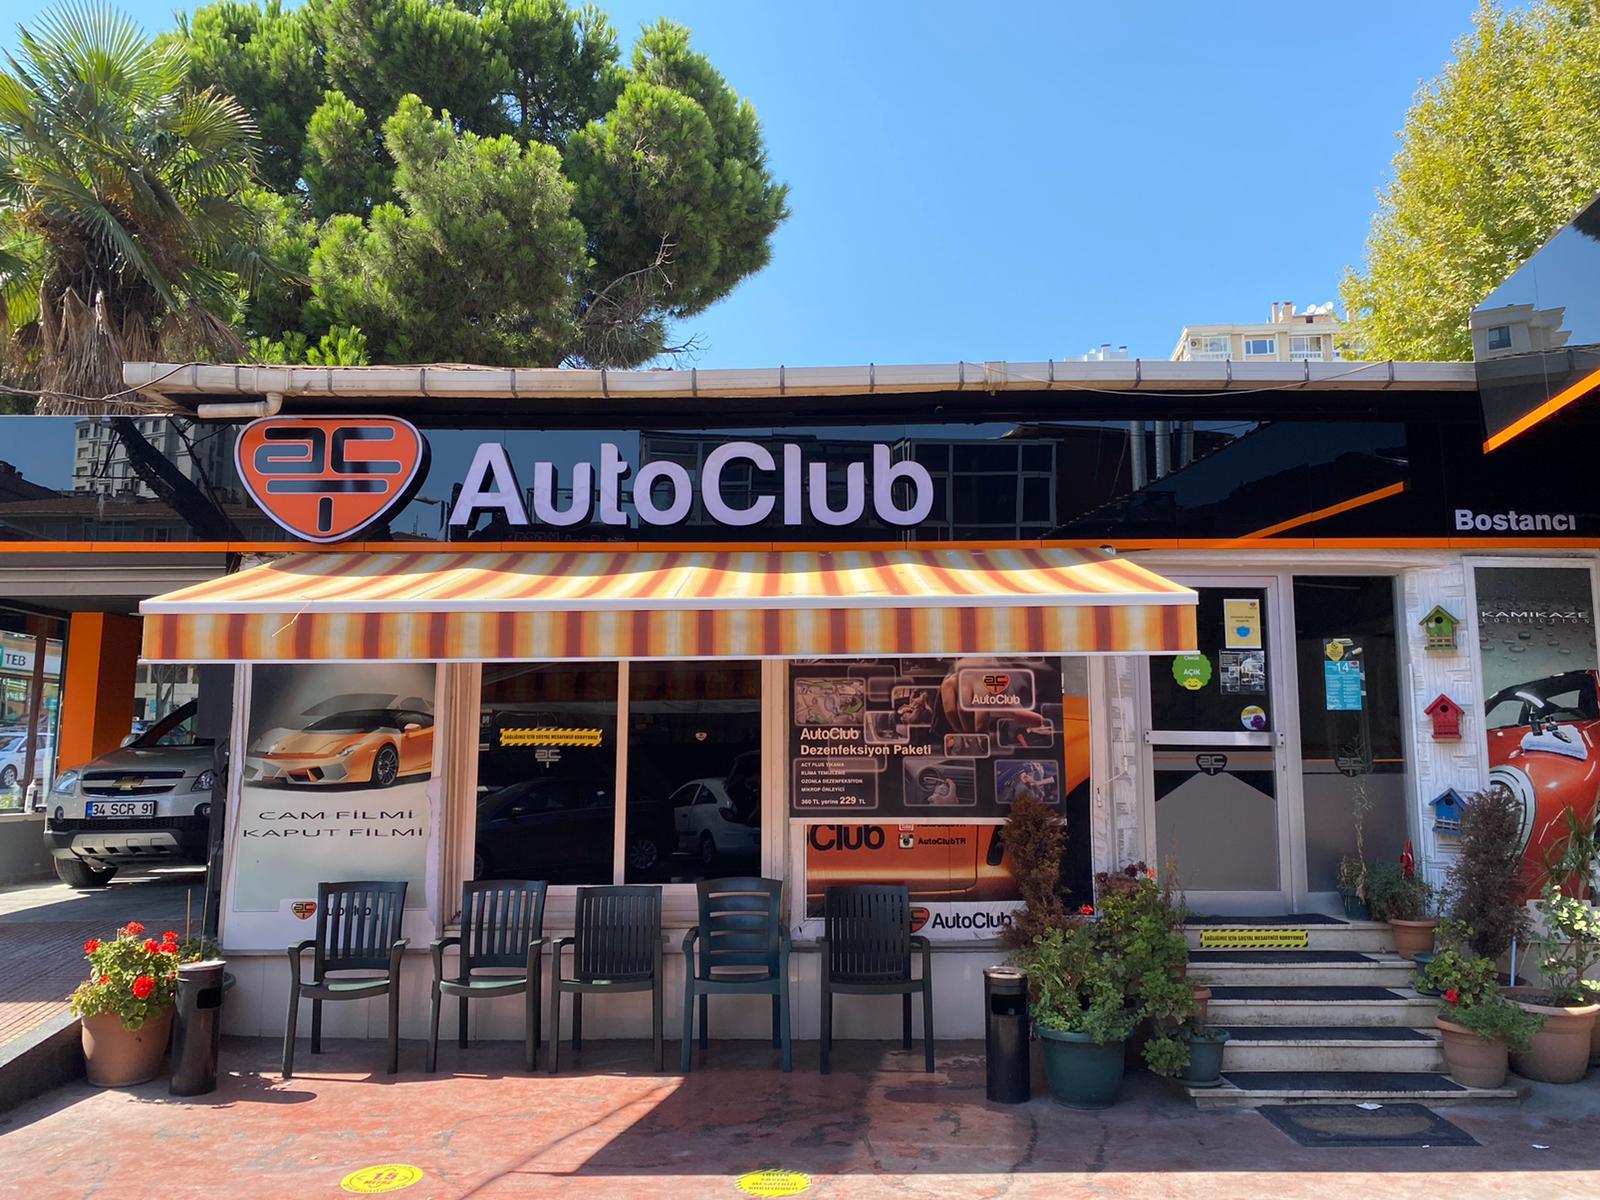 AutoClub Bostancı - İstanbul